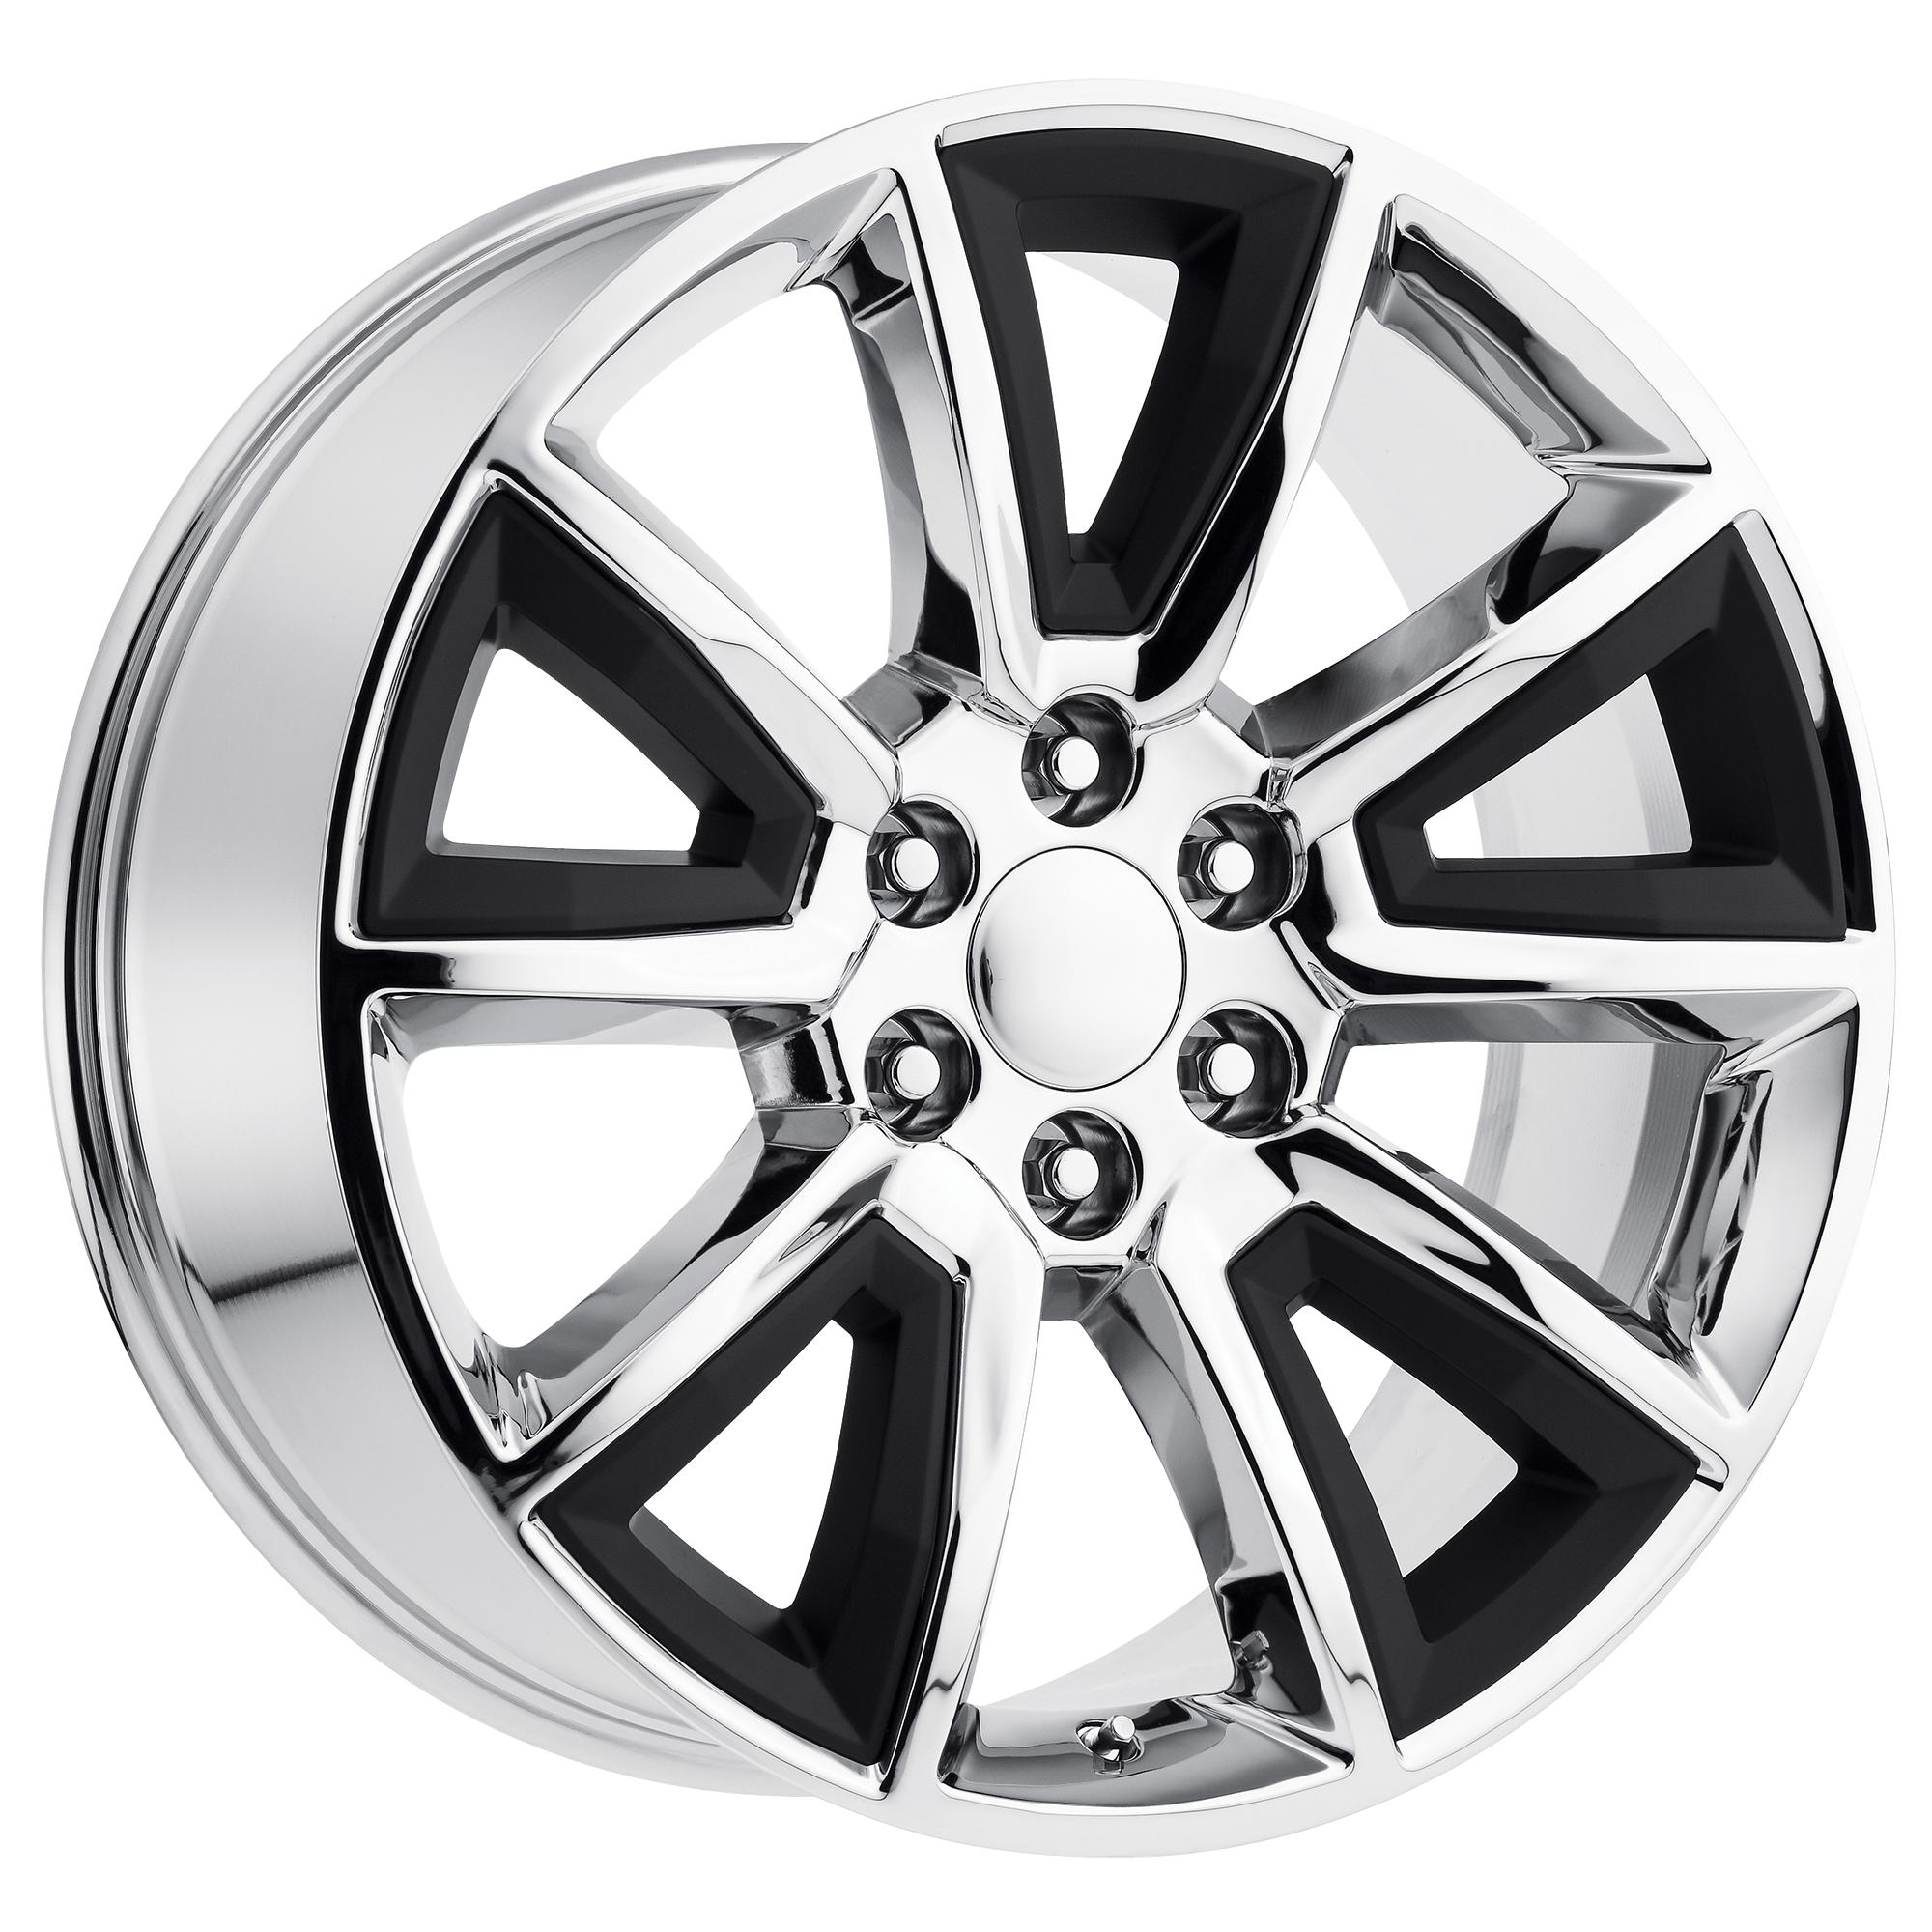 OE Creations Replica Wheels OE Creations PR168 Chrome w/ MB Accents